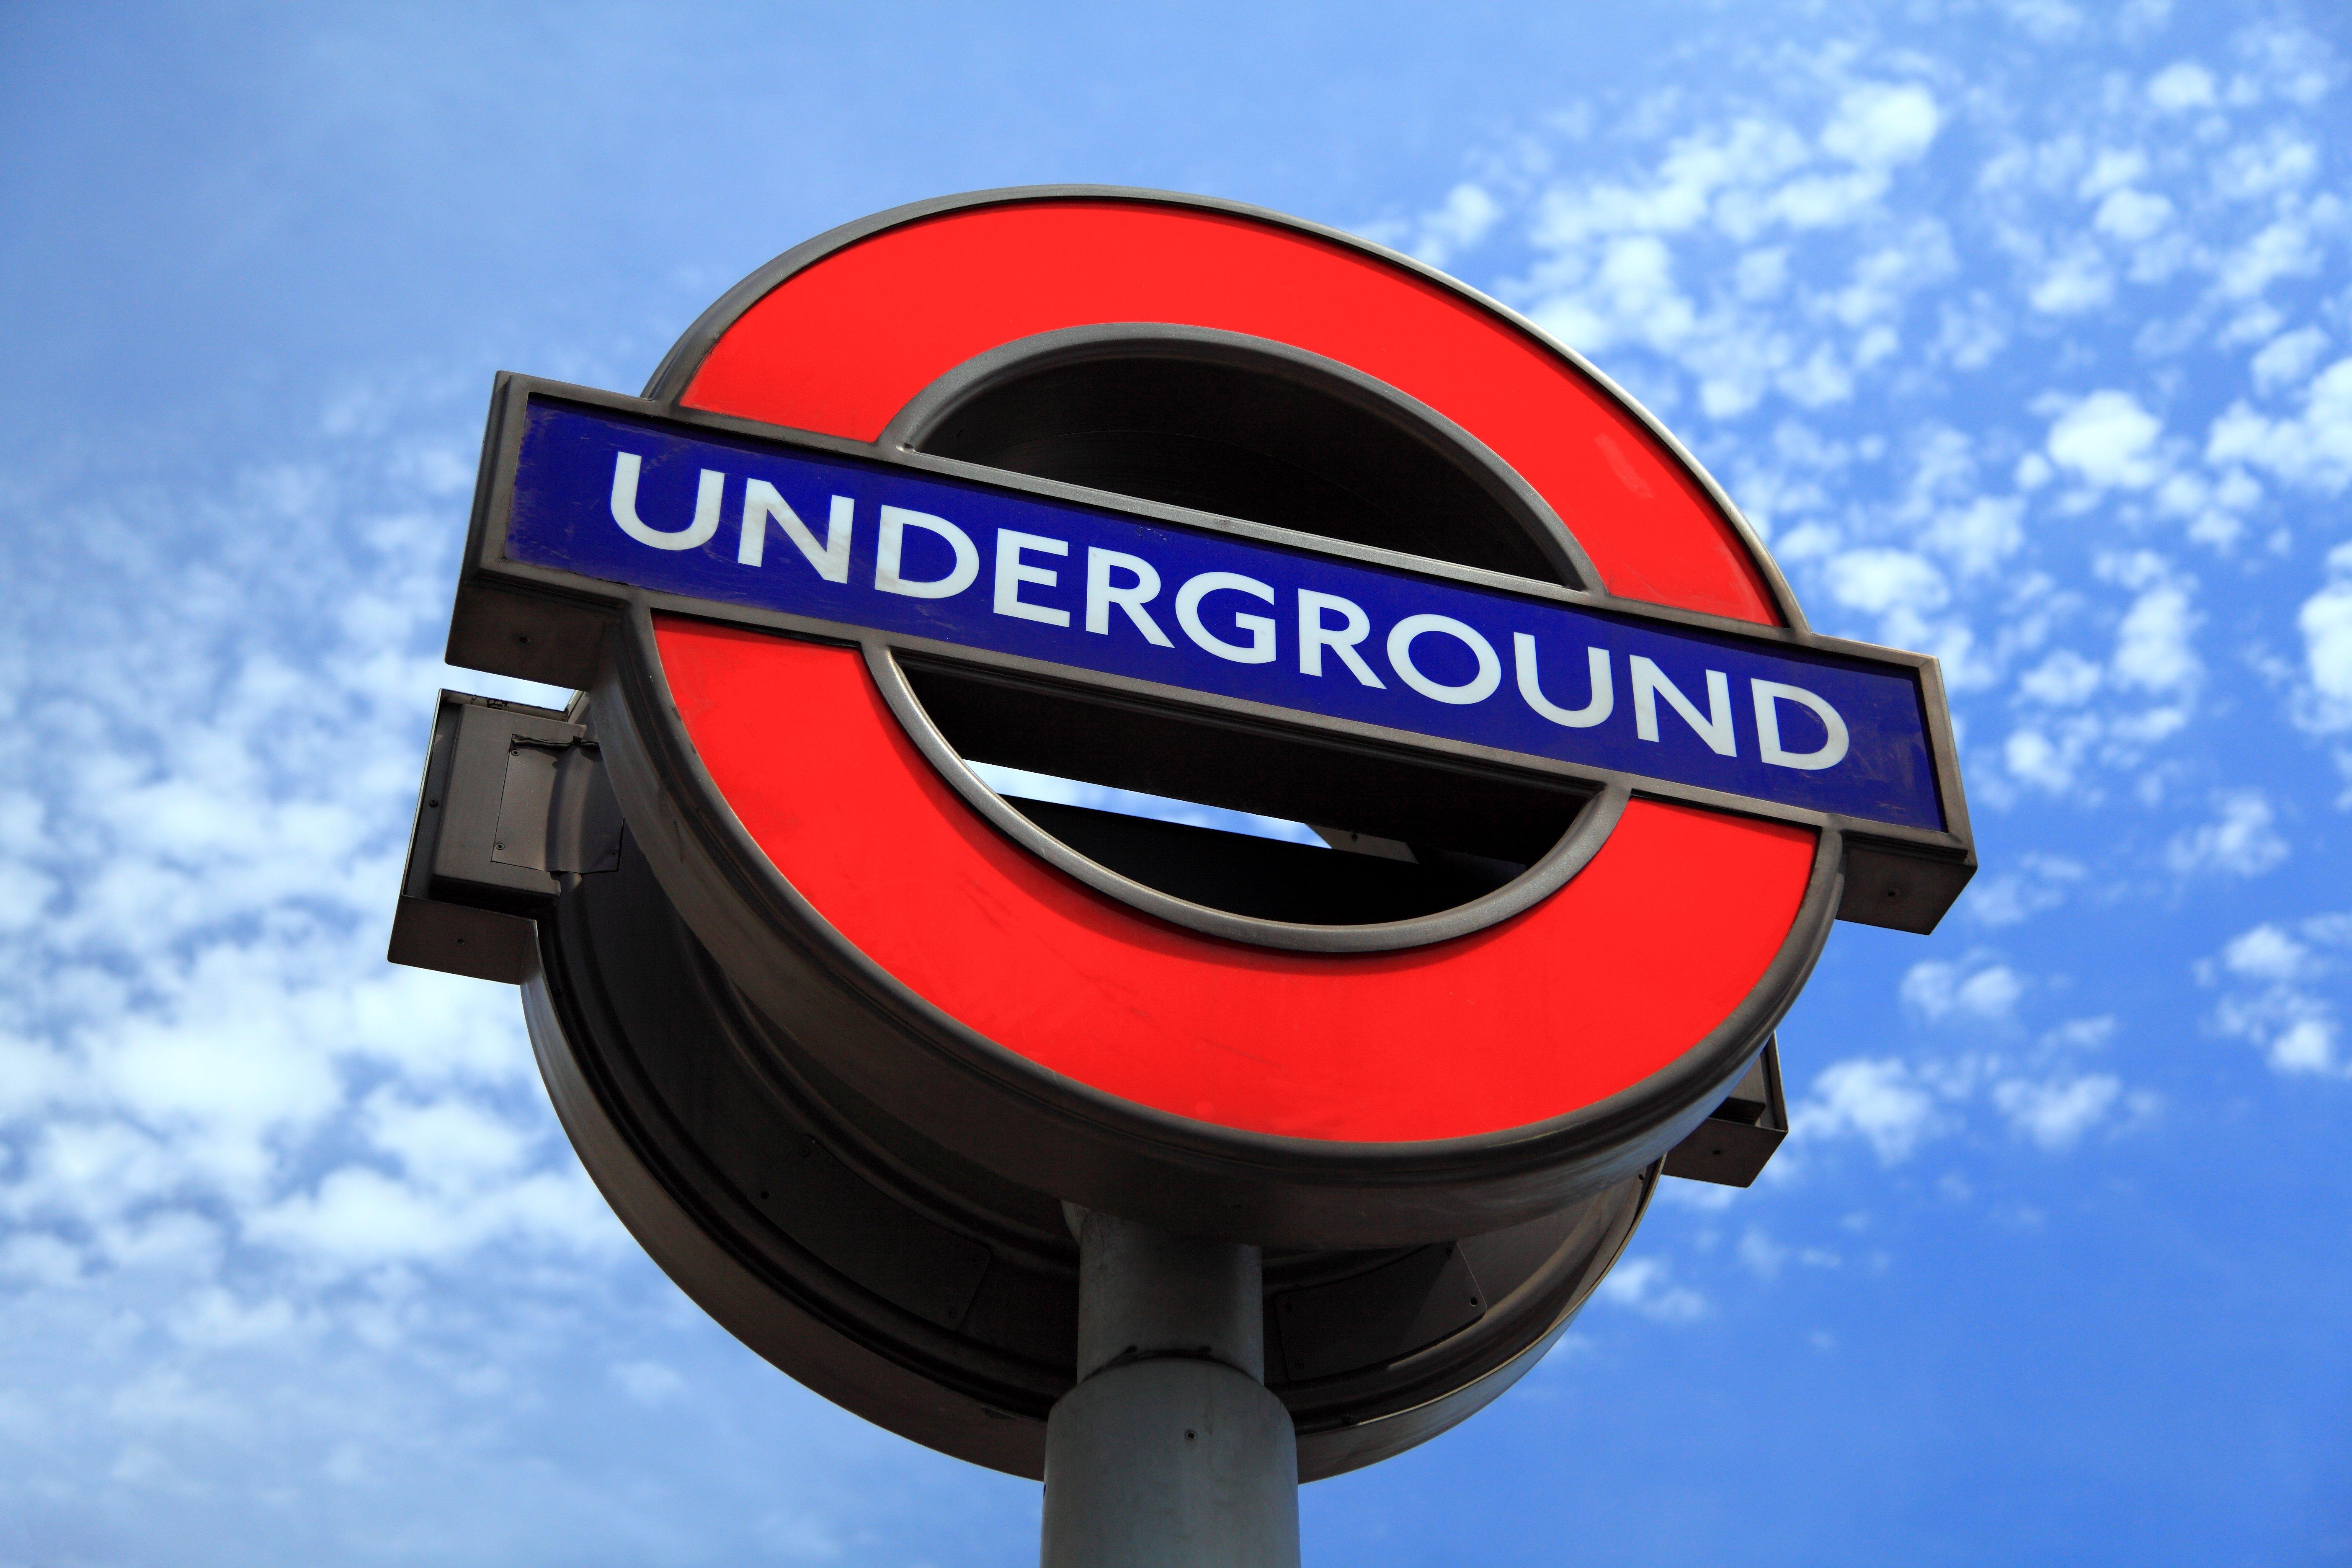 Metro zmian